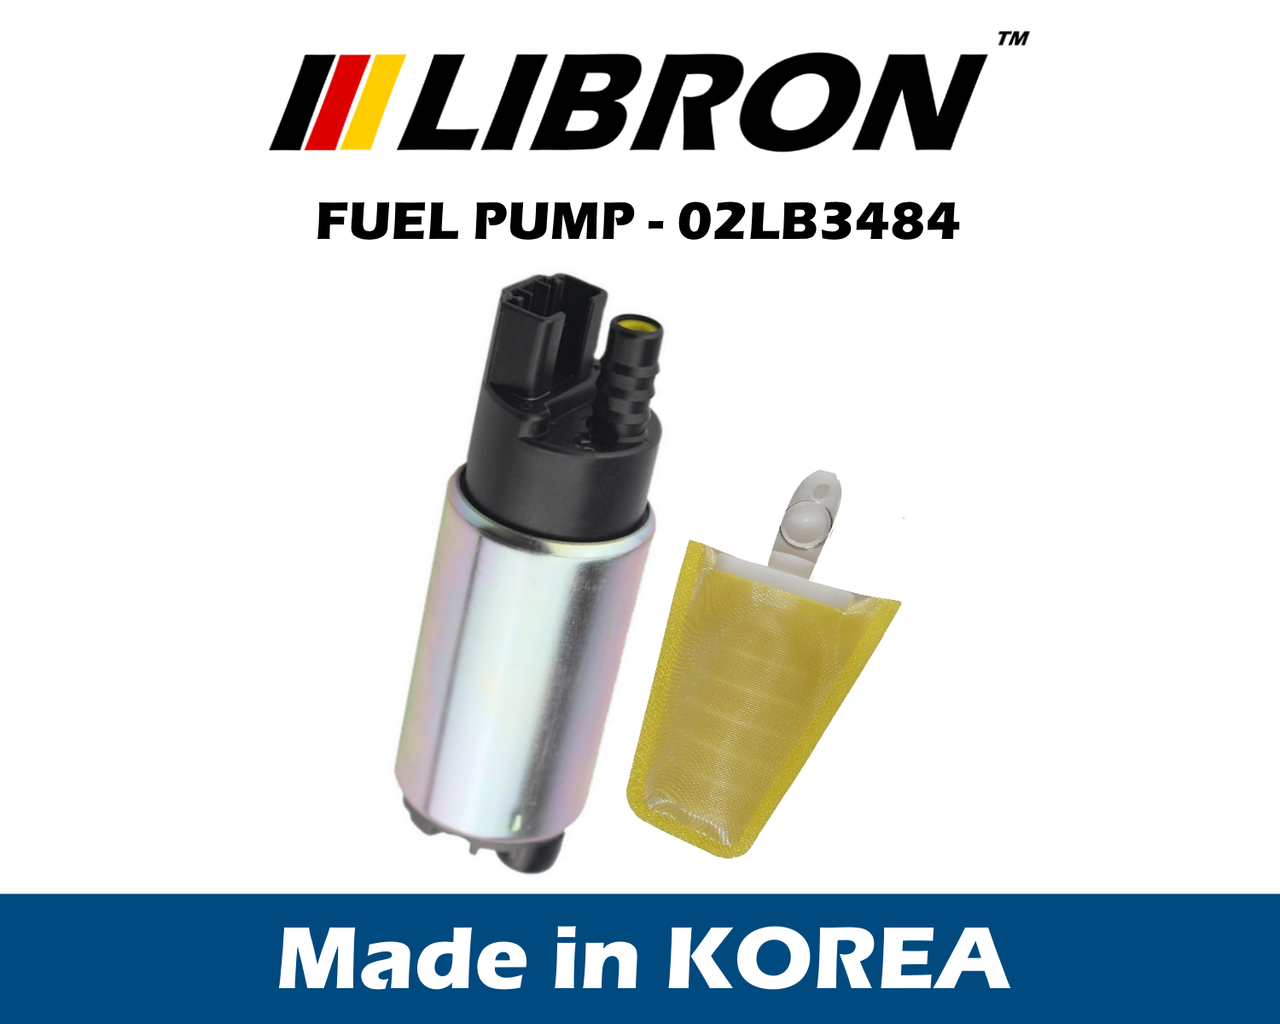 Топливный насос LIBRON 02LB3484 - KIA SEPHIA седан